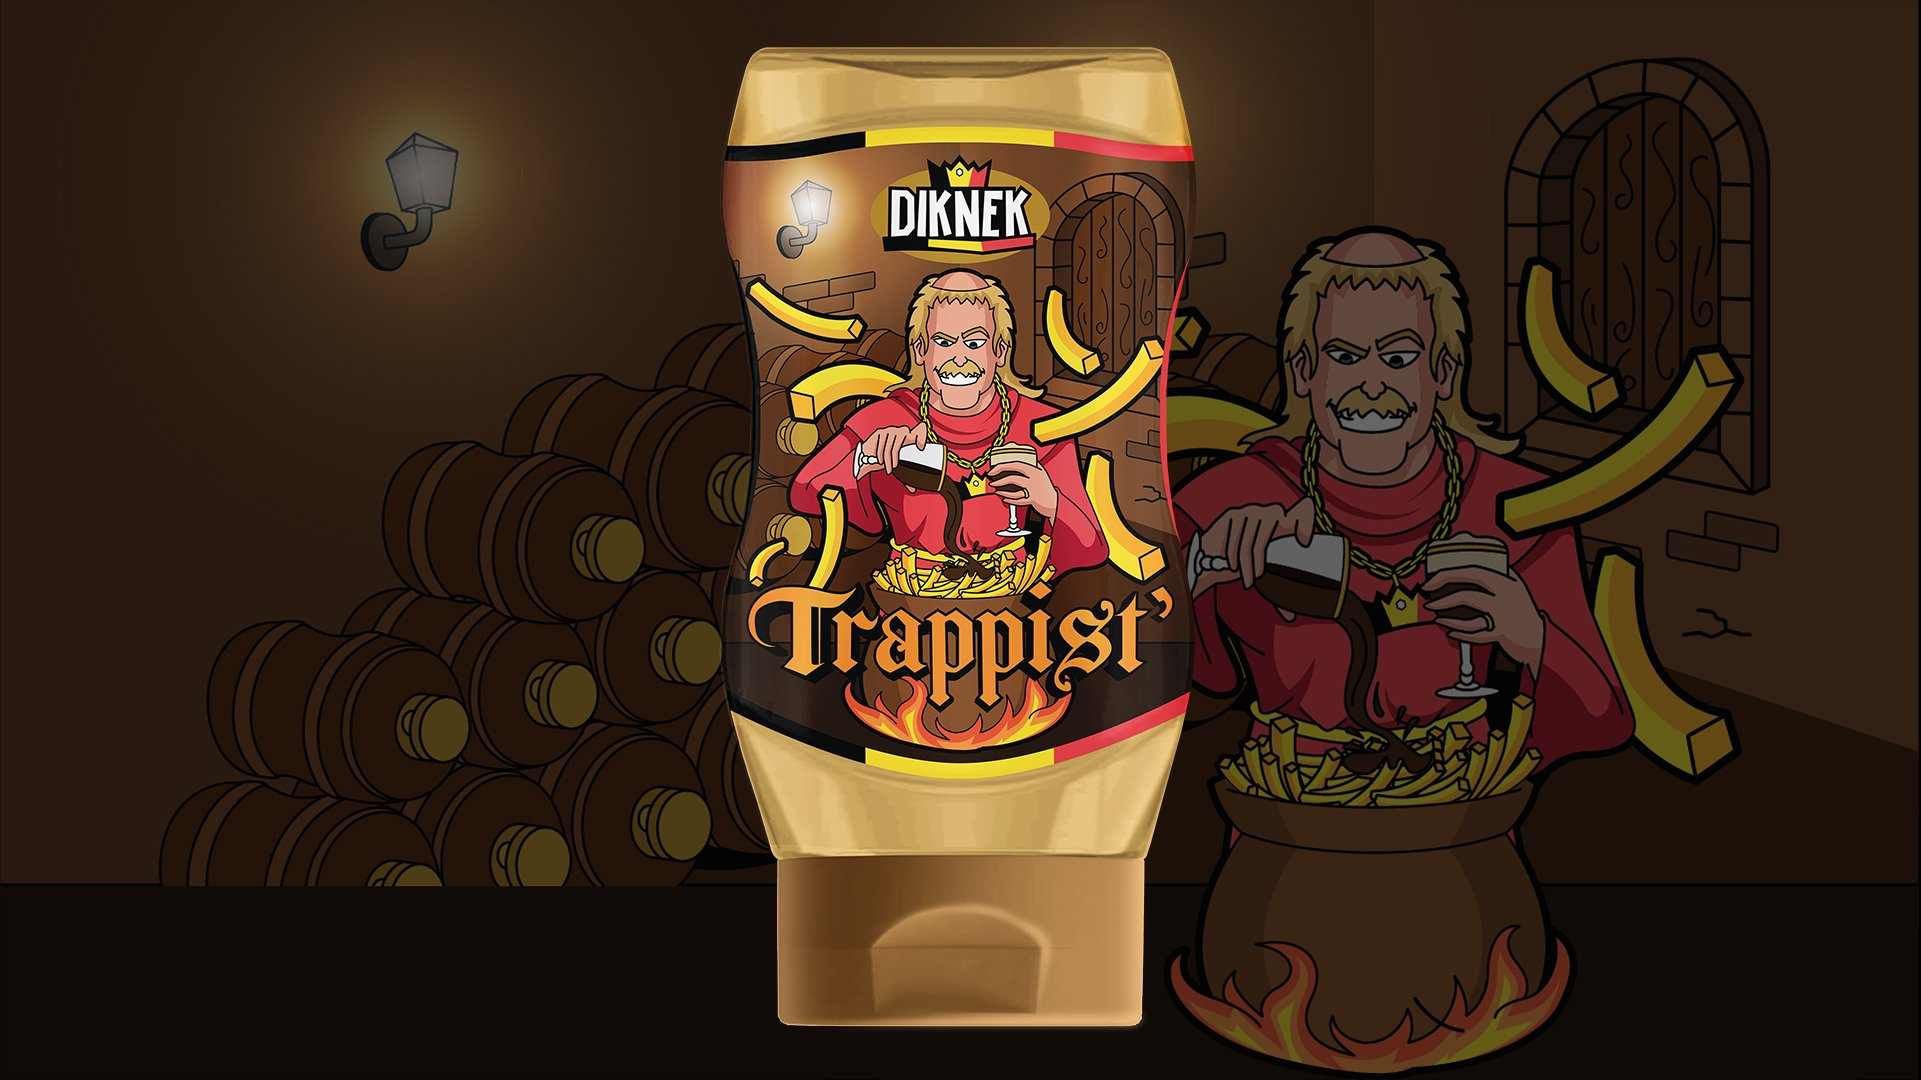 DIKNEK Trappist' Label Design